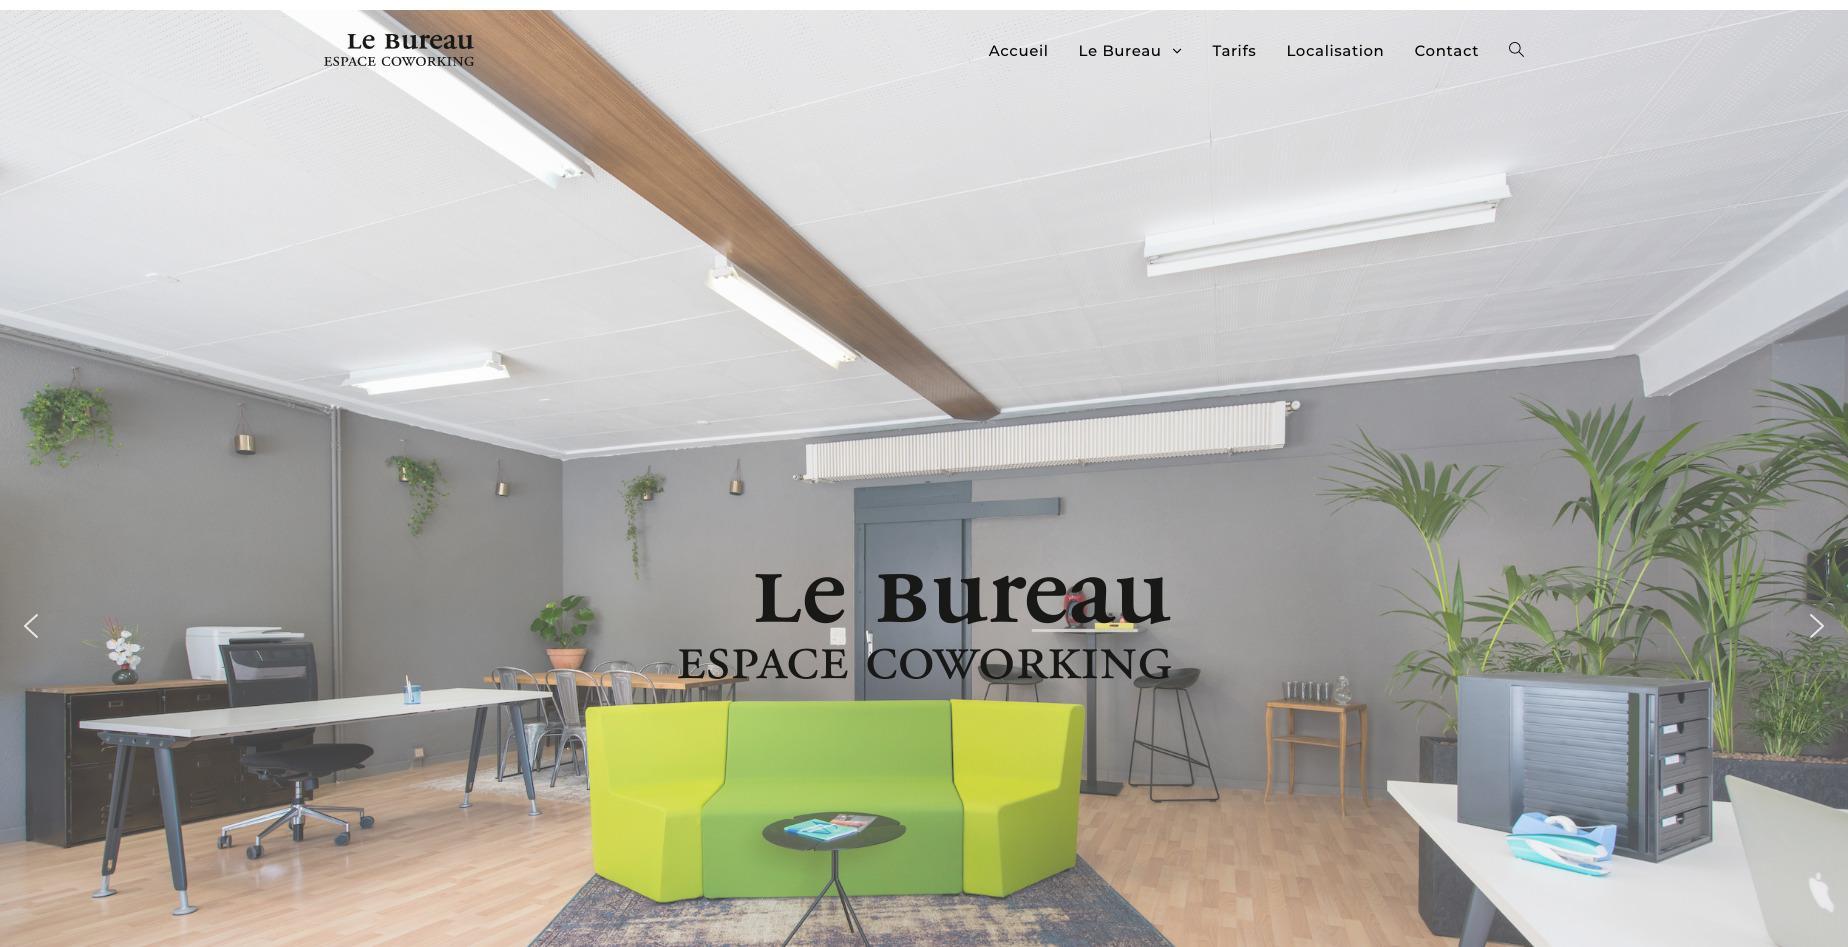 Le Bureau - Espace coworking